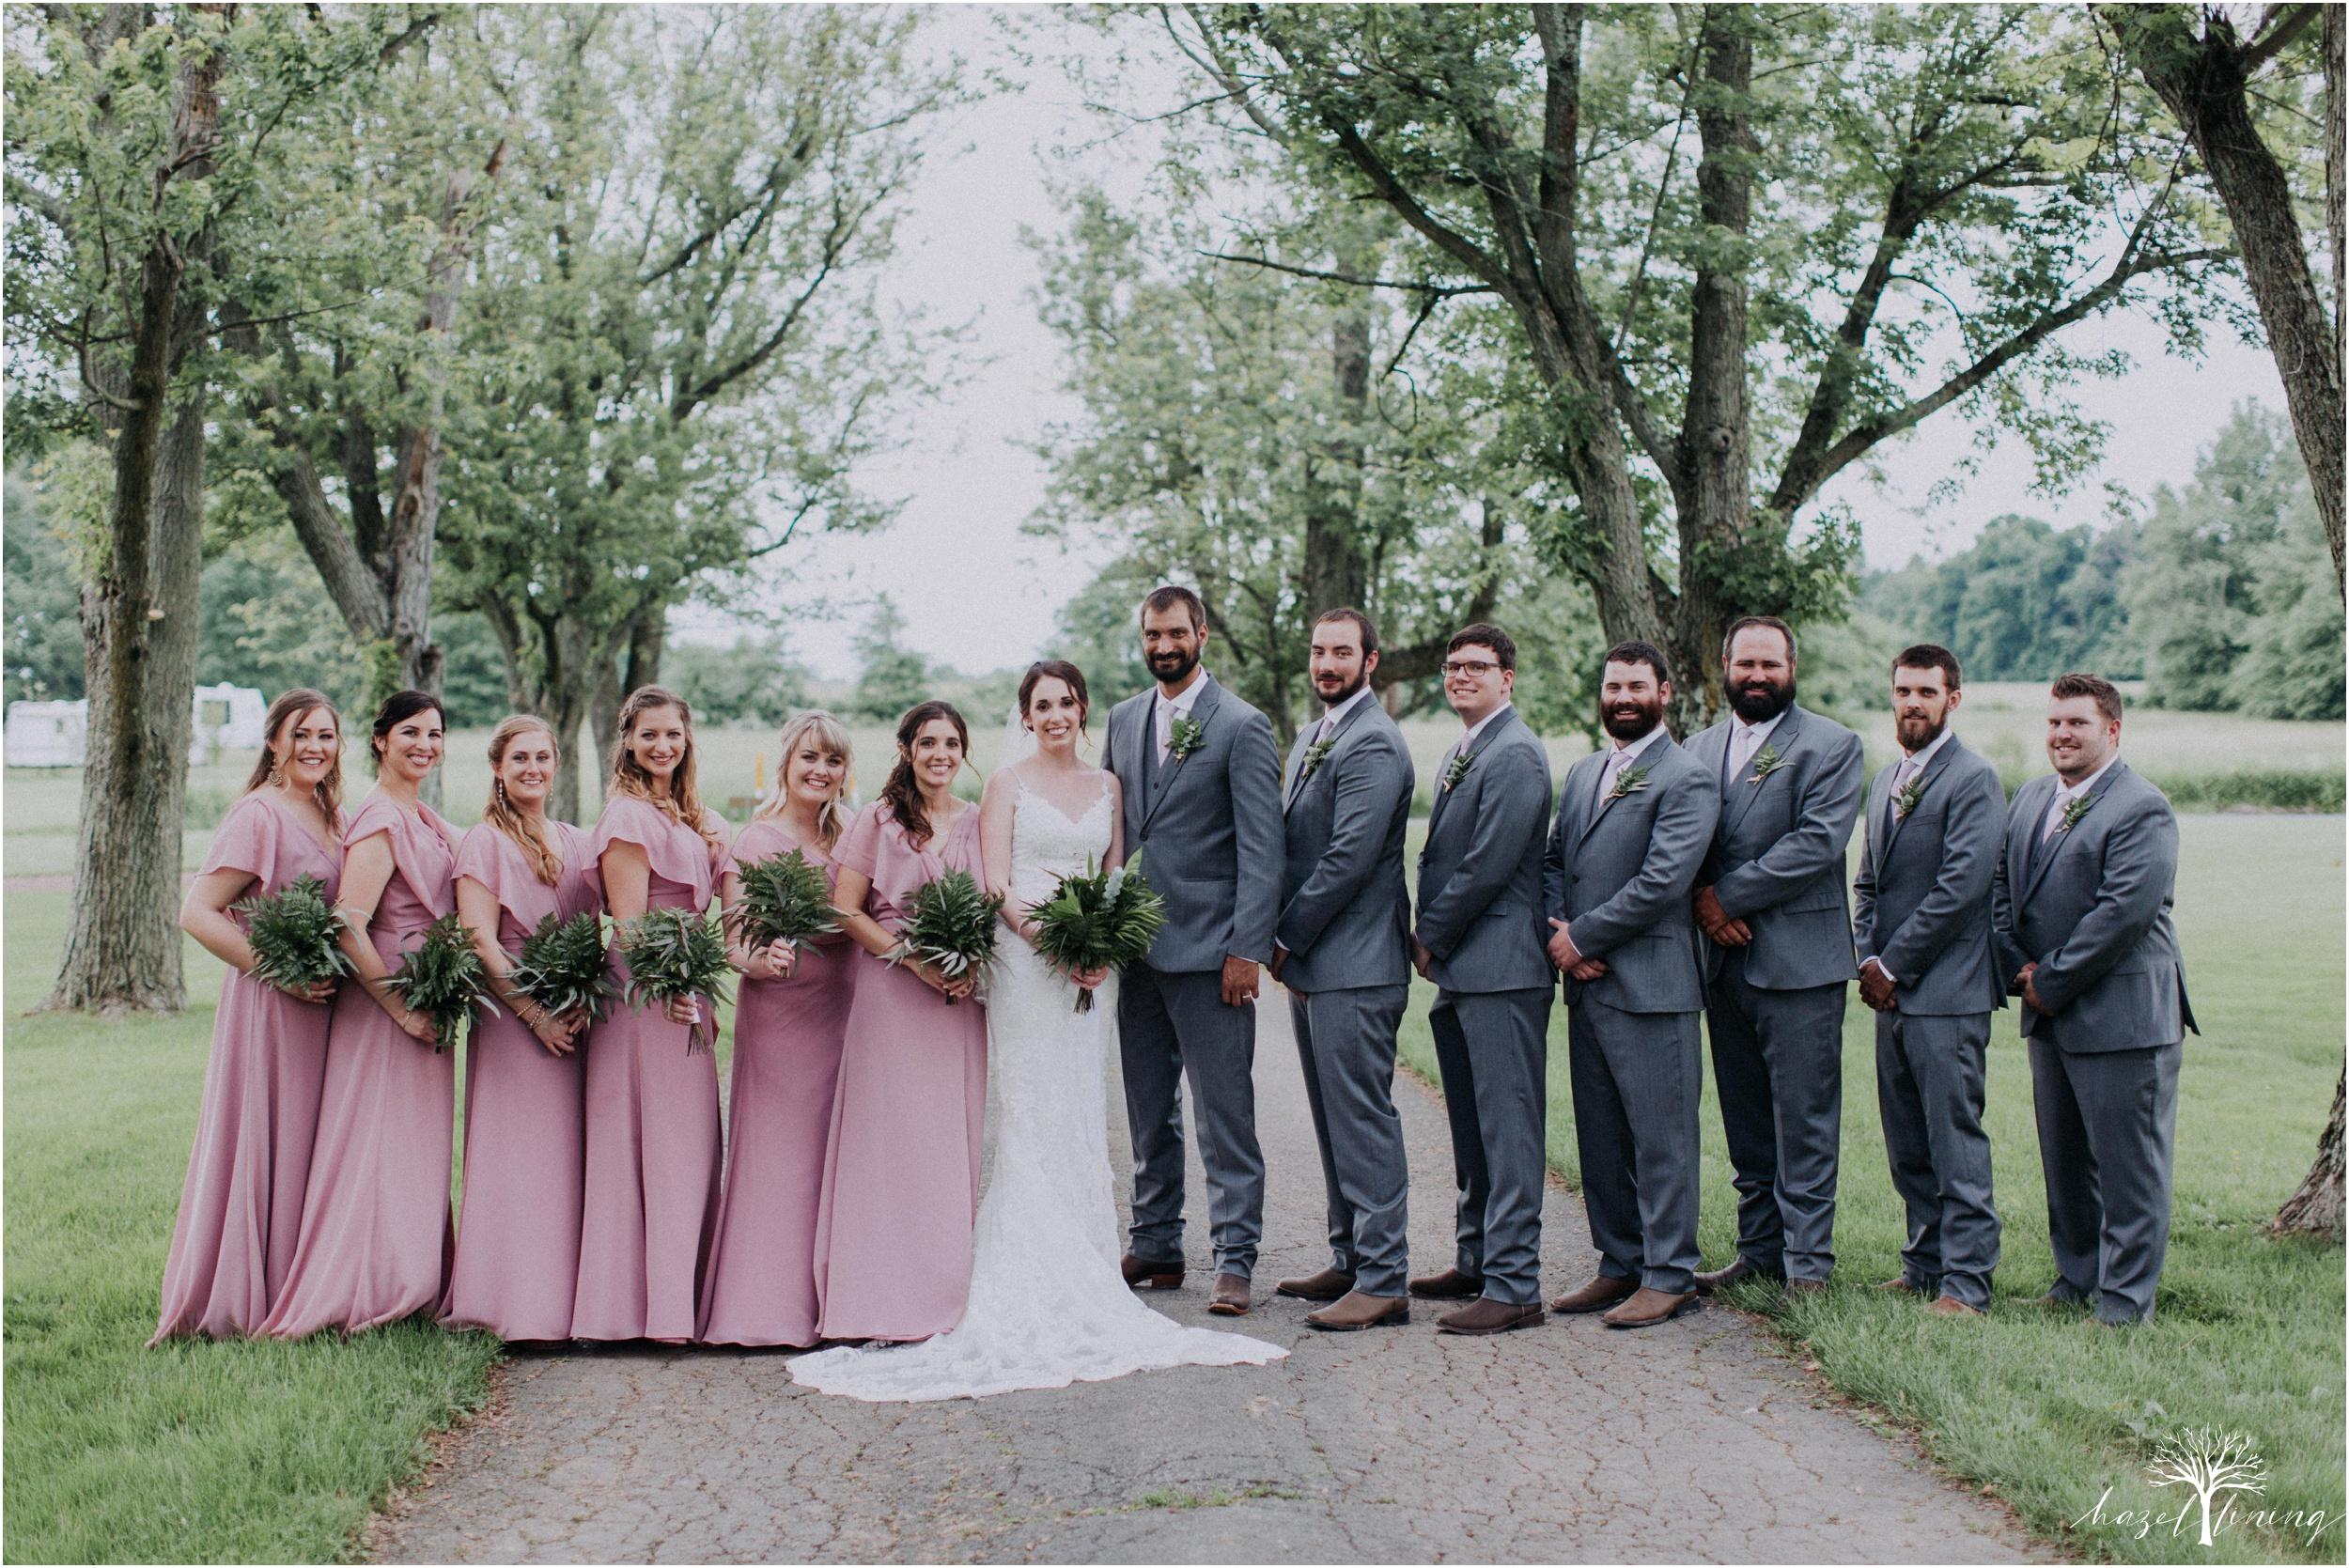 hazel-lining-travel-wedding-elopement-photography-lisa-landon-shoemaker-the-farm-bakery-and-events-bucks-county-quakertown-pennsylvania-summer-country-outdoor-farm-wedding_0068.jpg